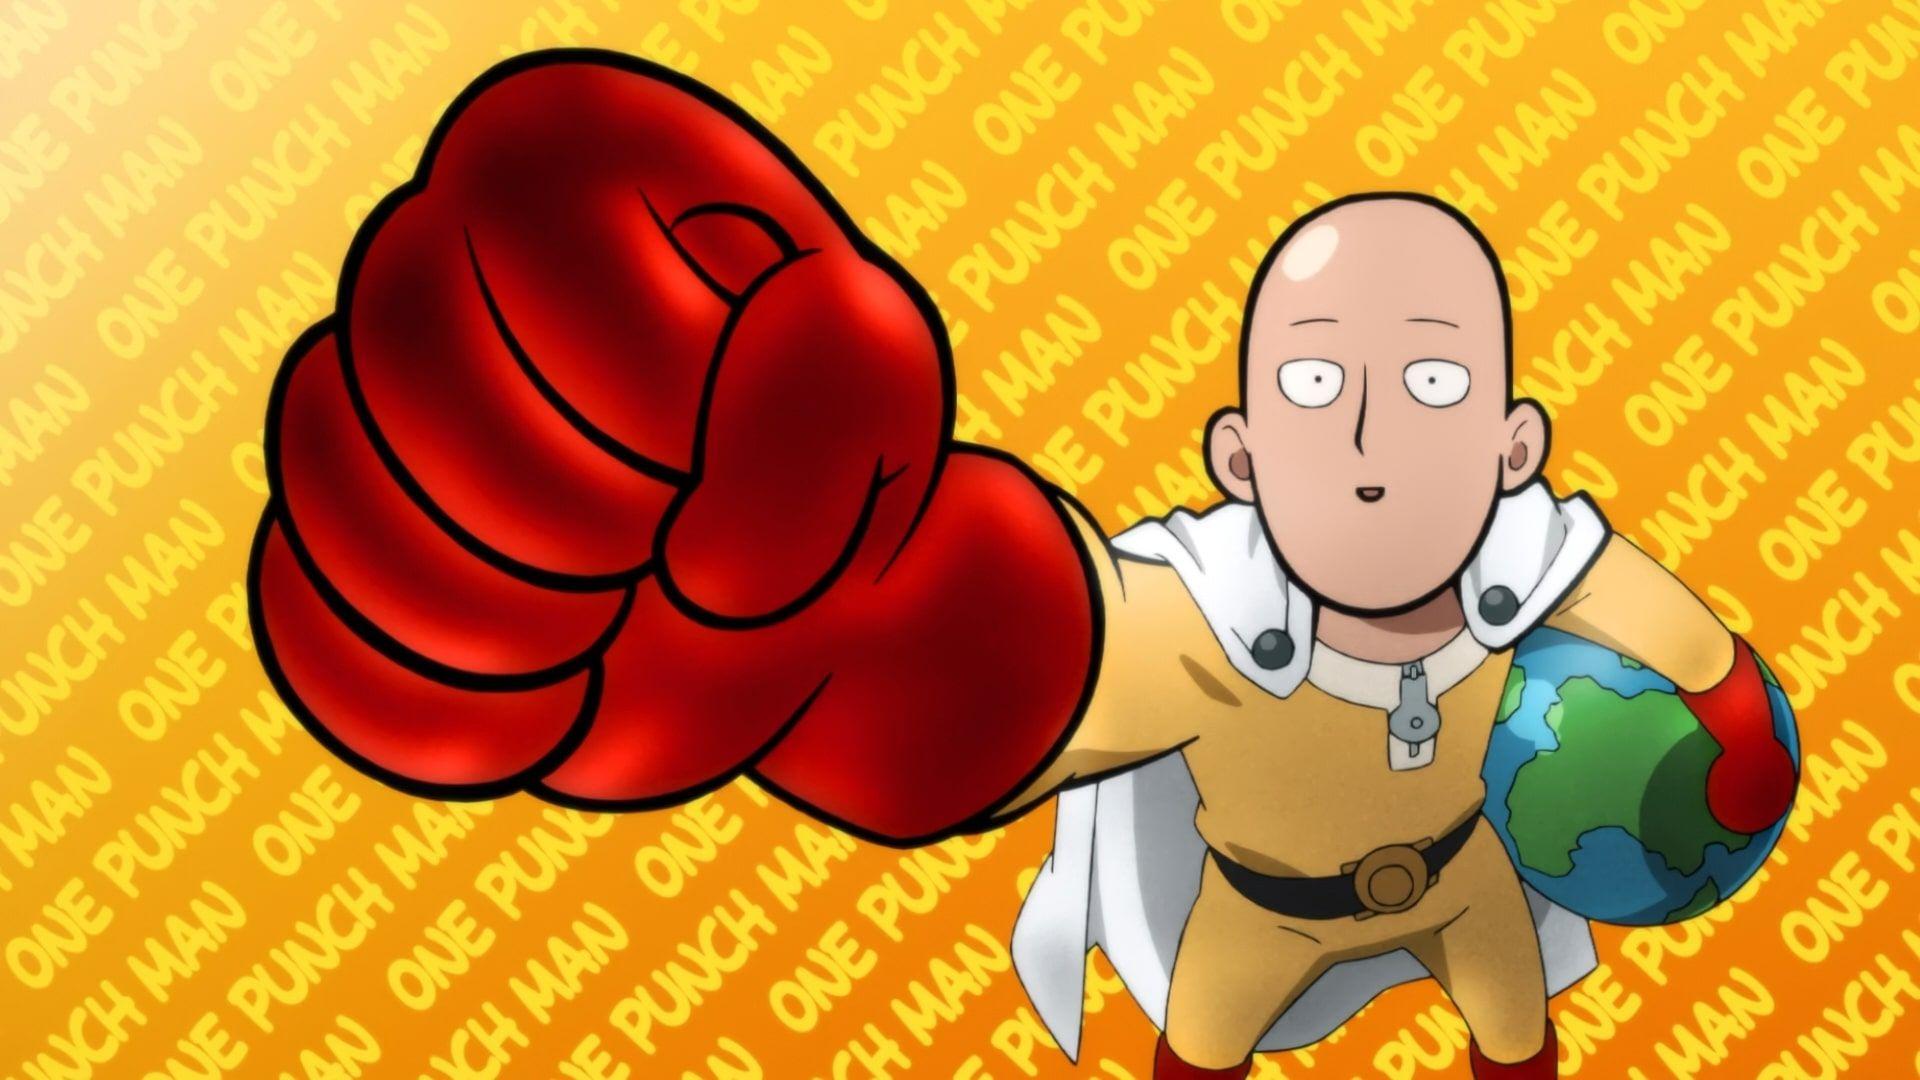 One Punch Man Season 2 Opening Wallpaper Punch man, One